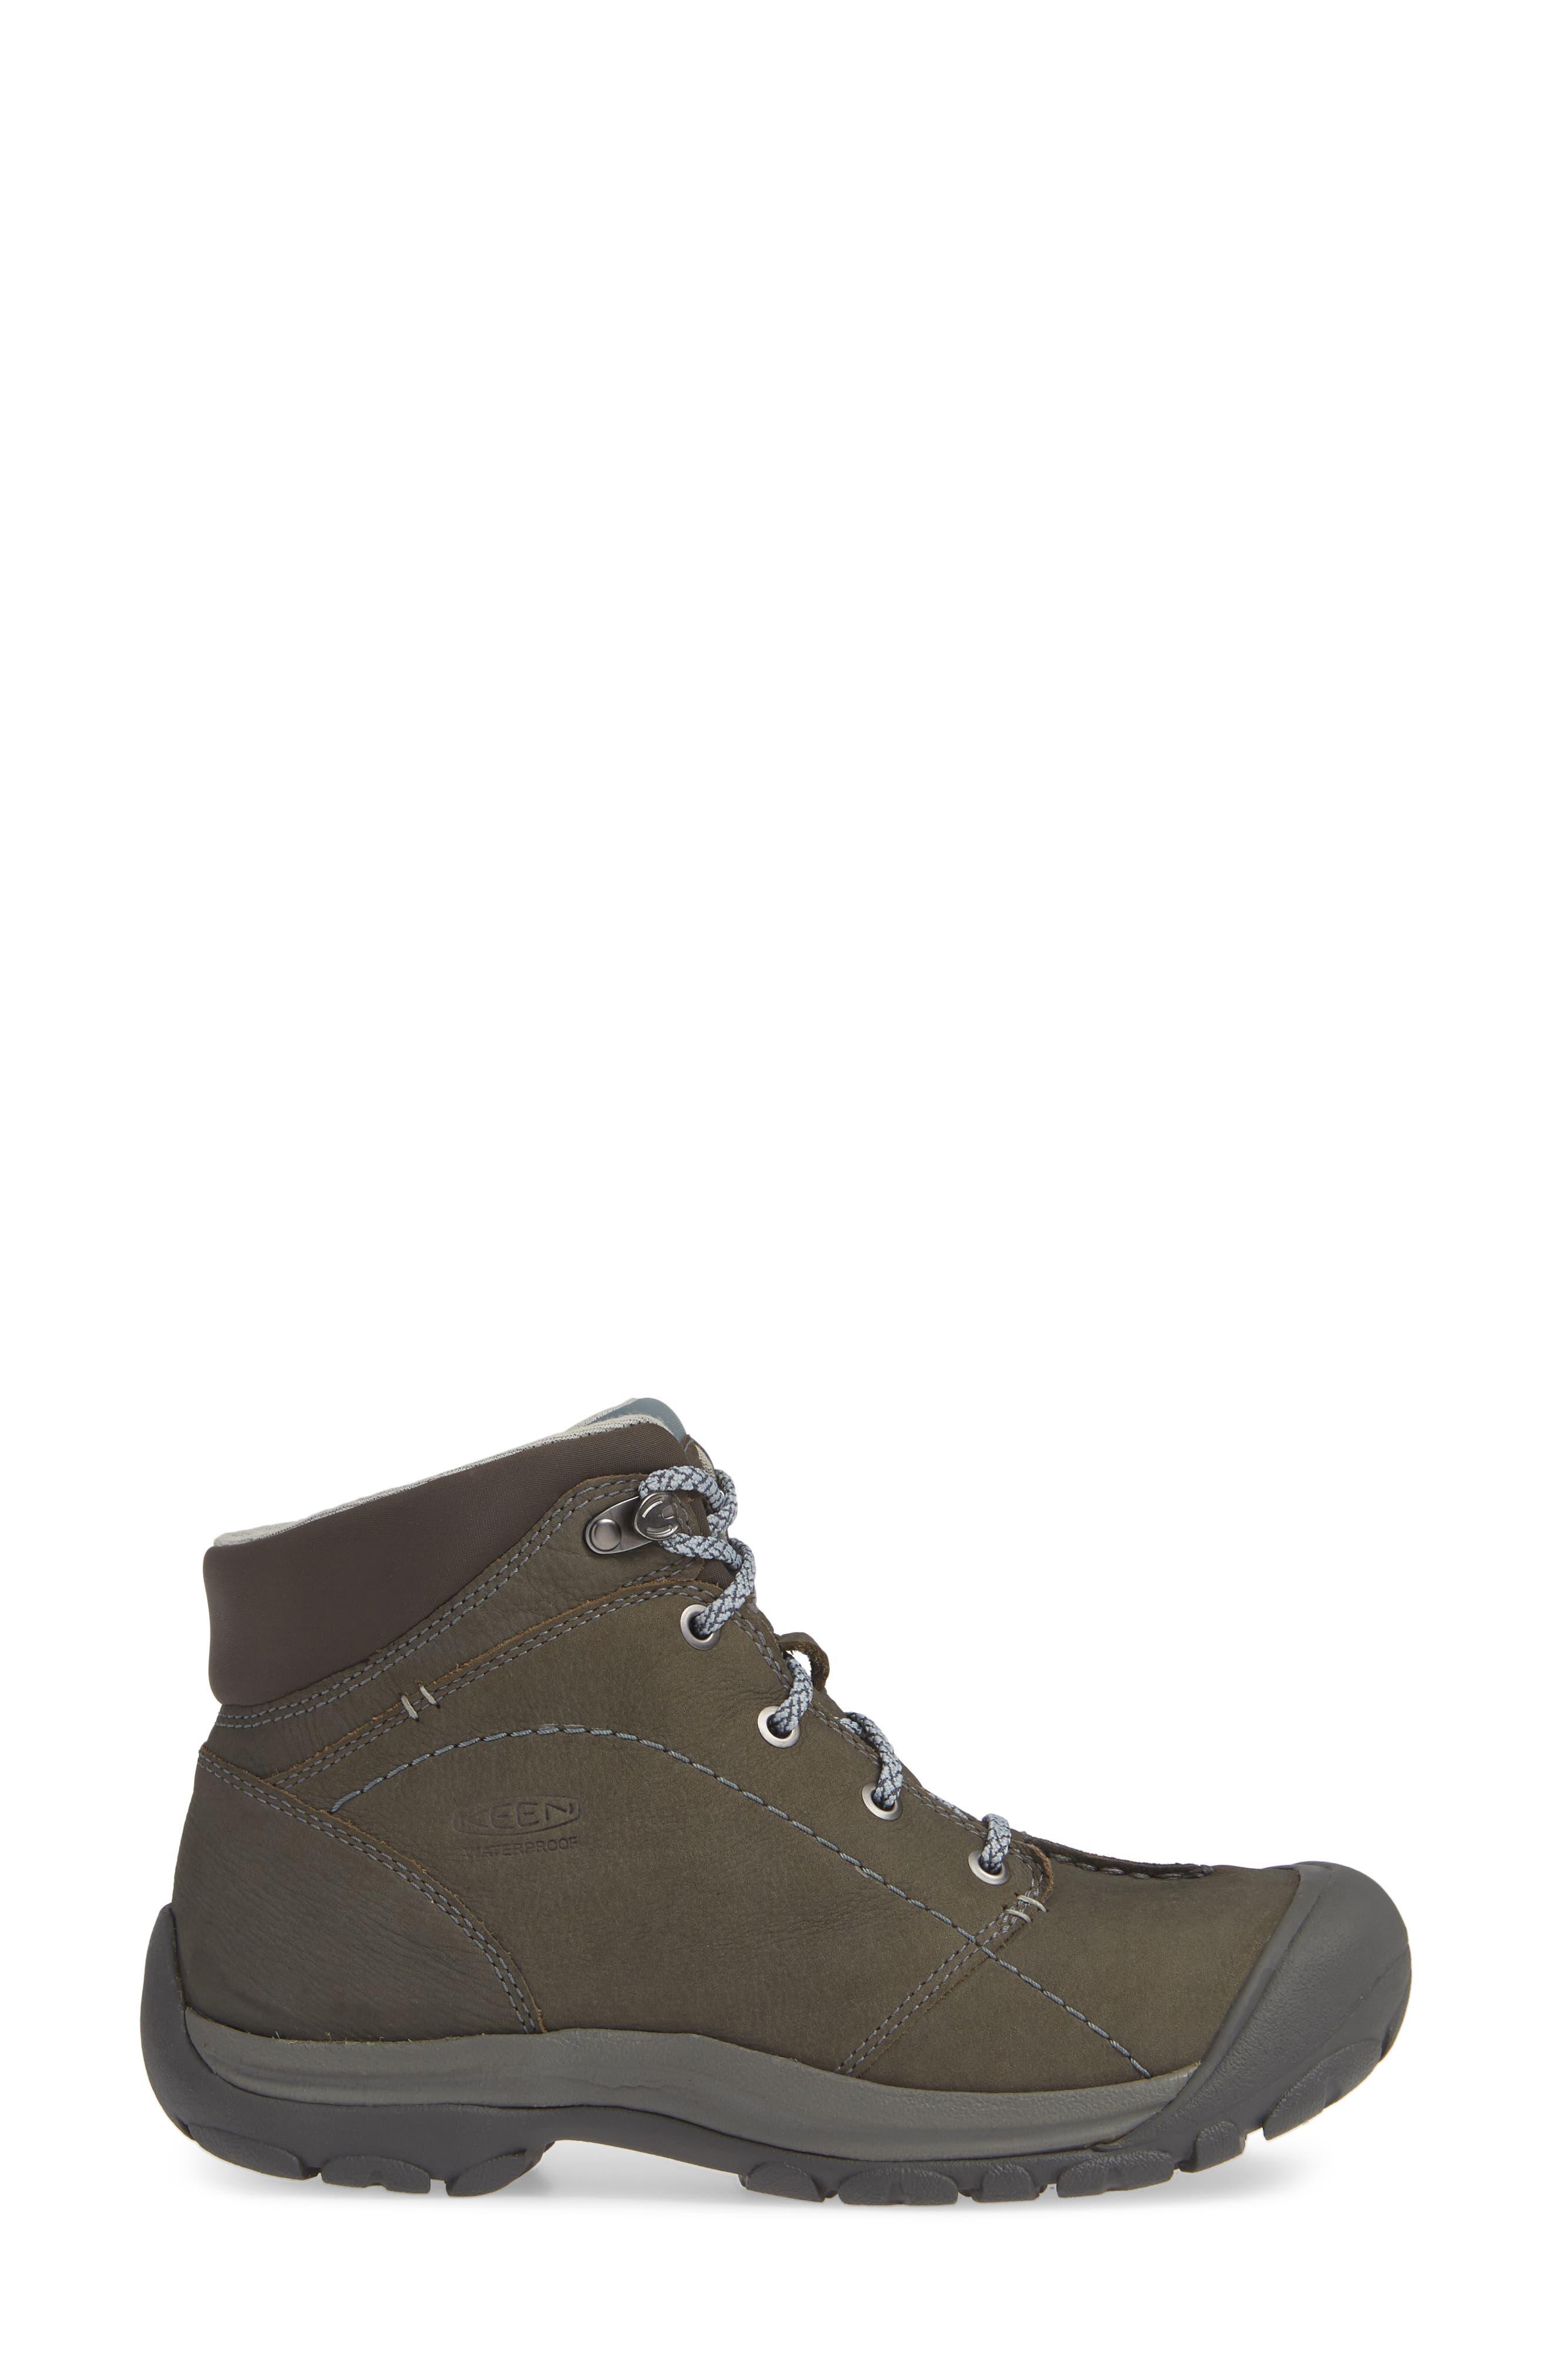 Kaci Waterproof Winter Boot,                             Alternate thumbnail 3, color,                             TURBULENCE/ STORMY WEATHER